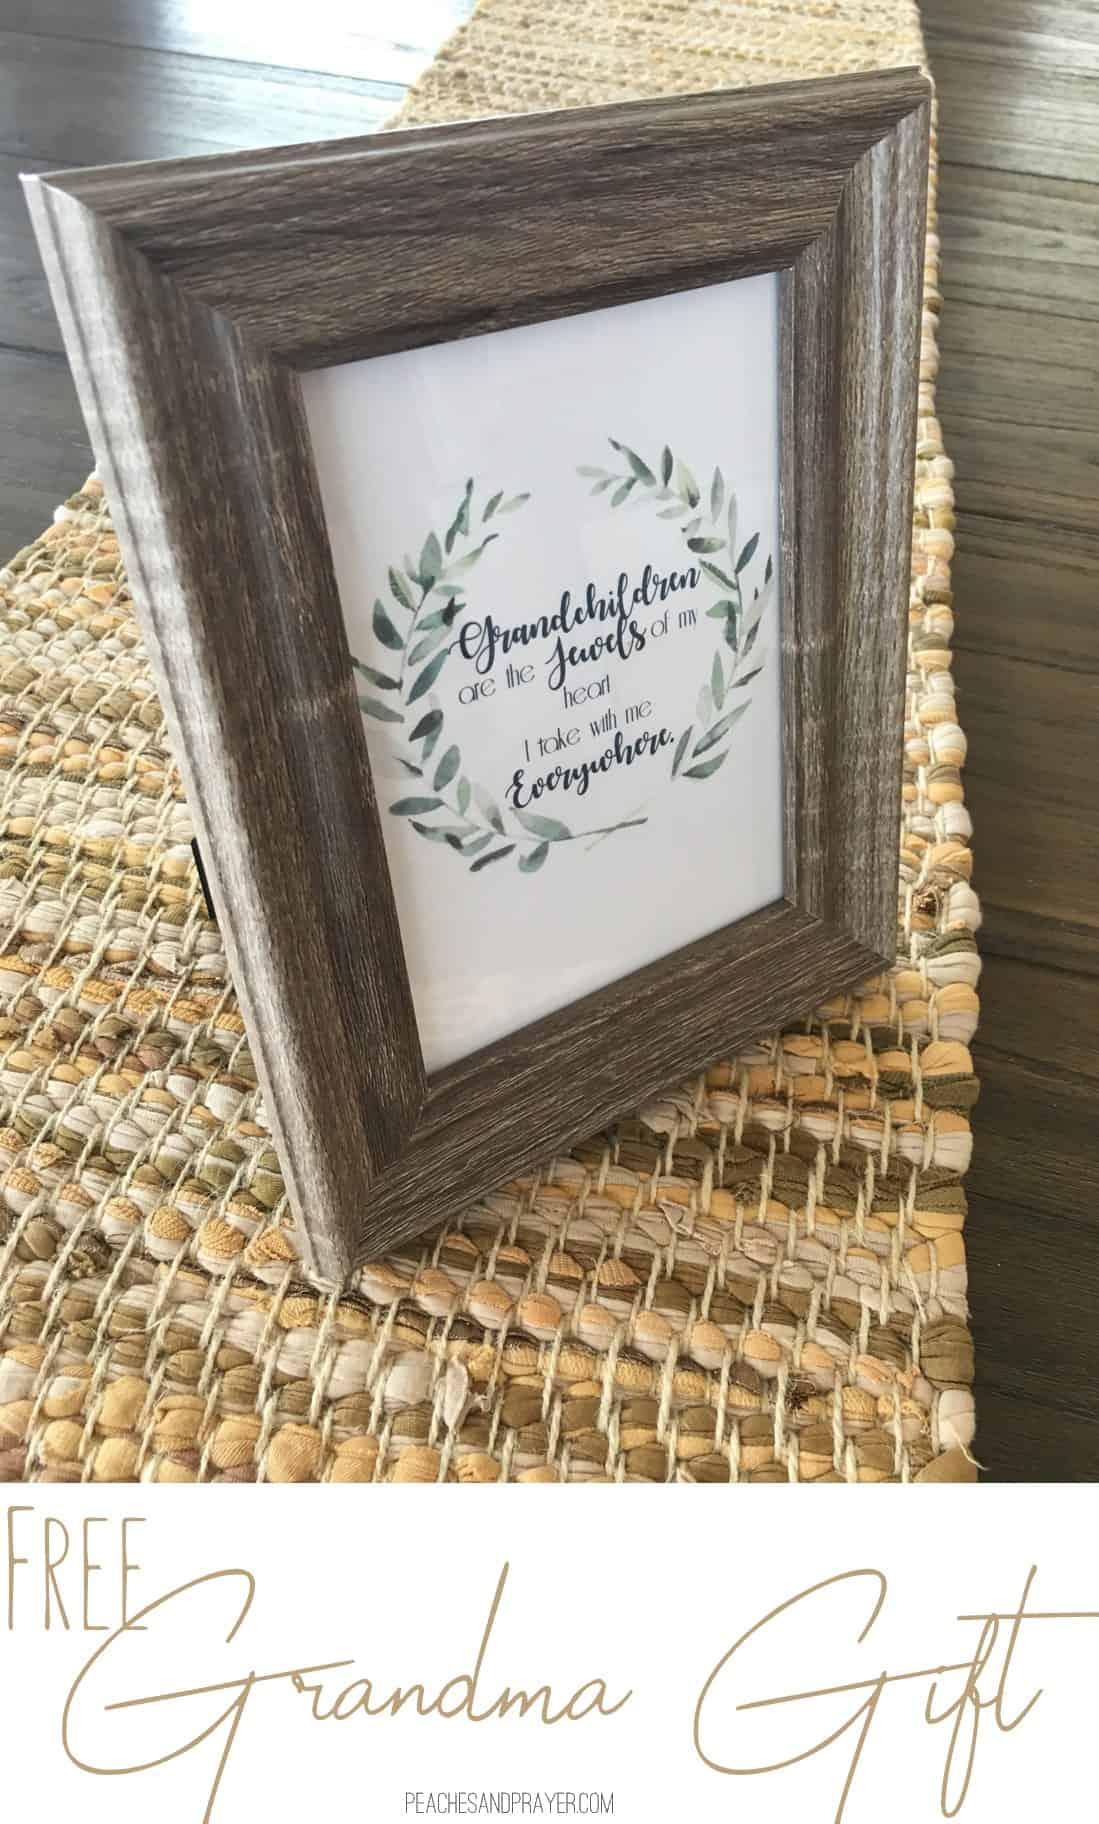 Free Gift for Grandma